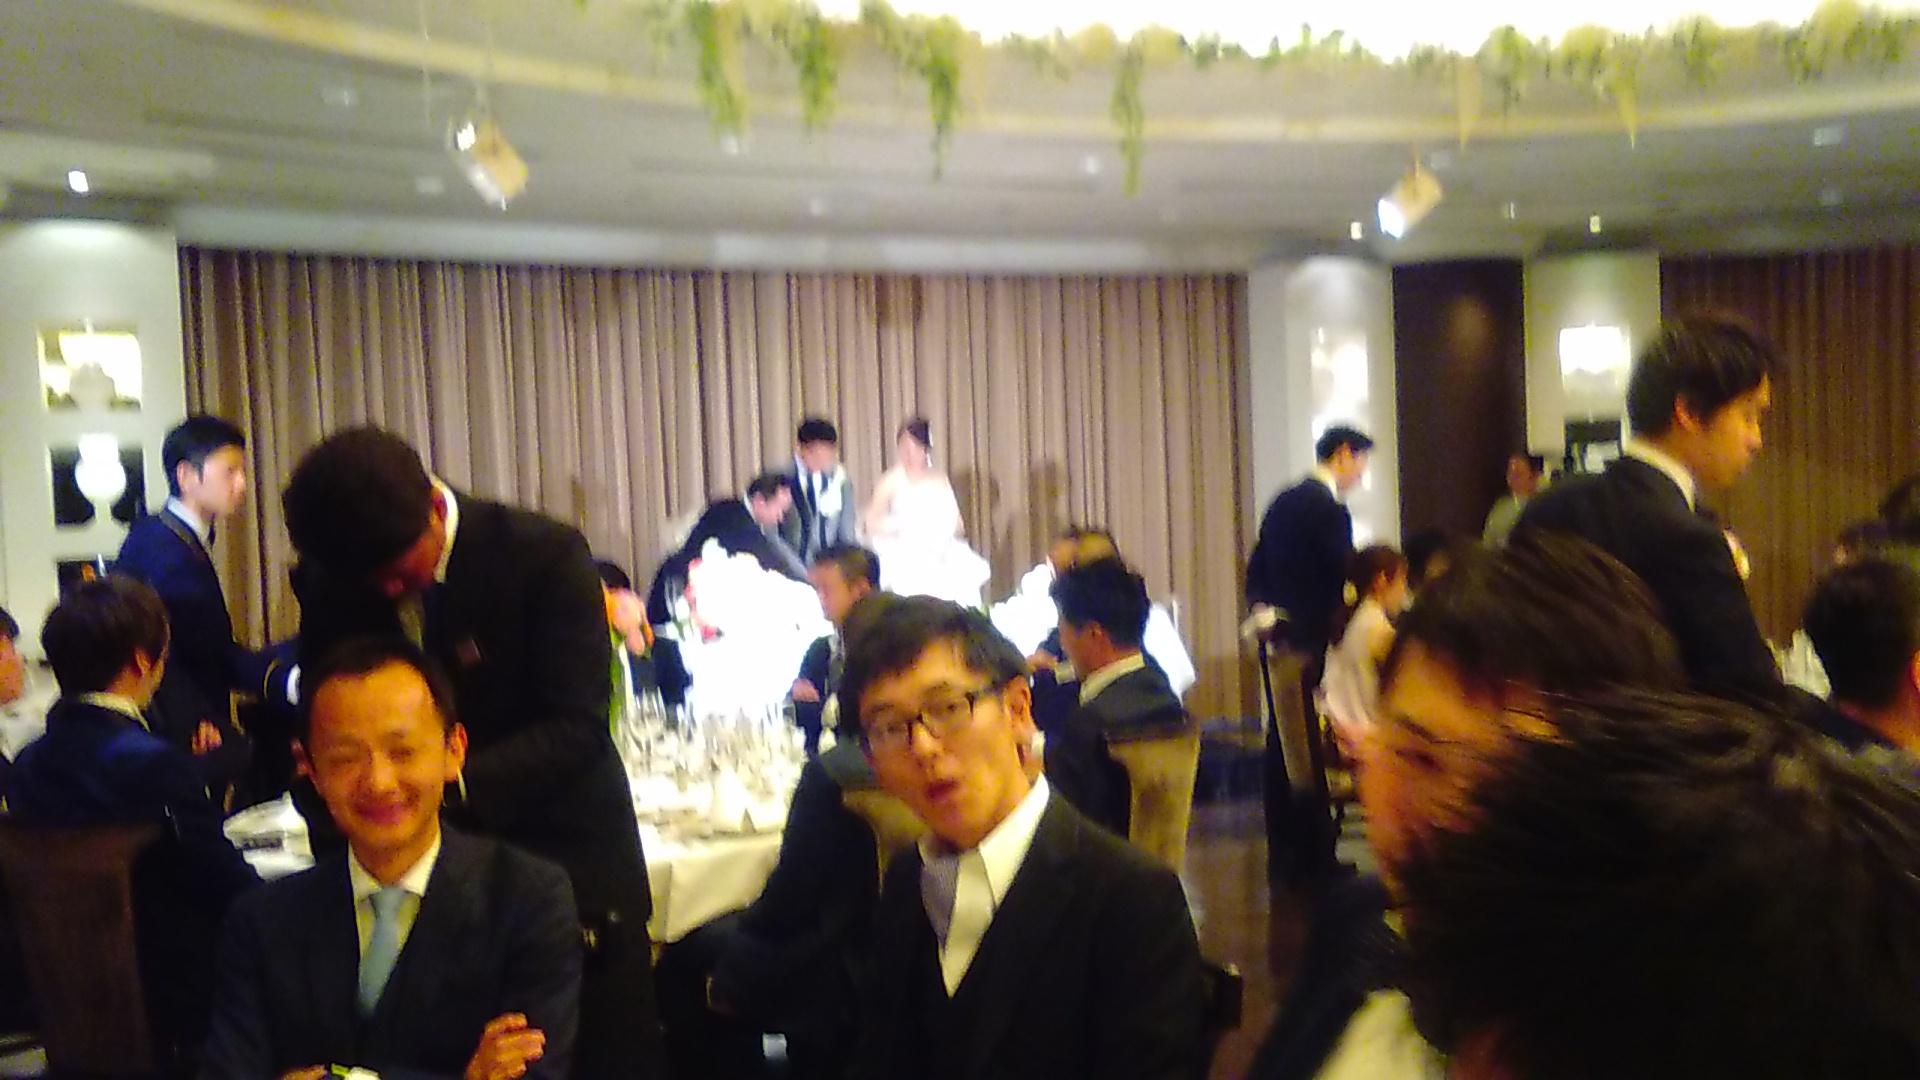 KIMG0666 - 結婚式